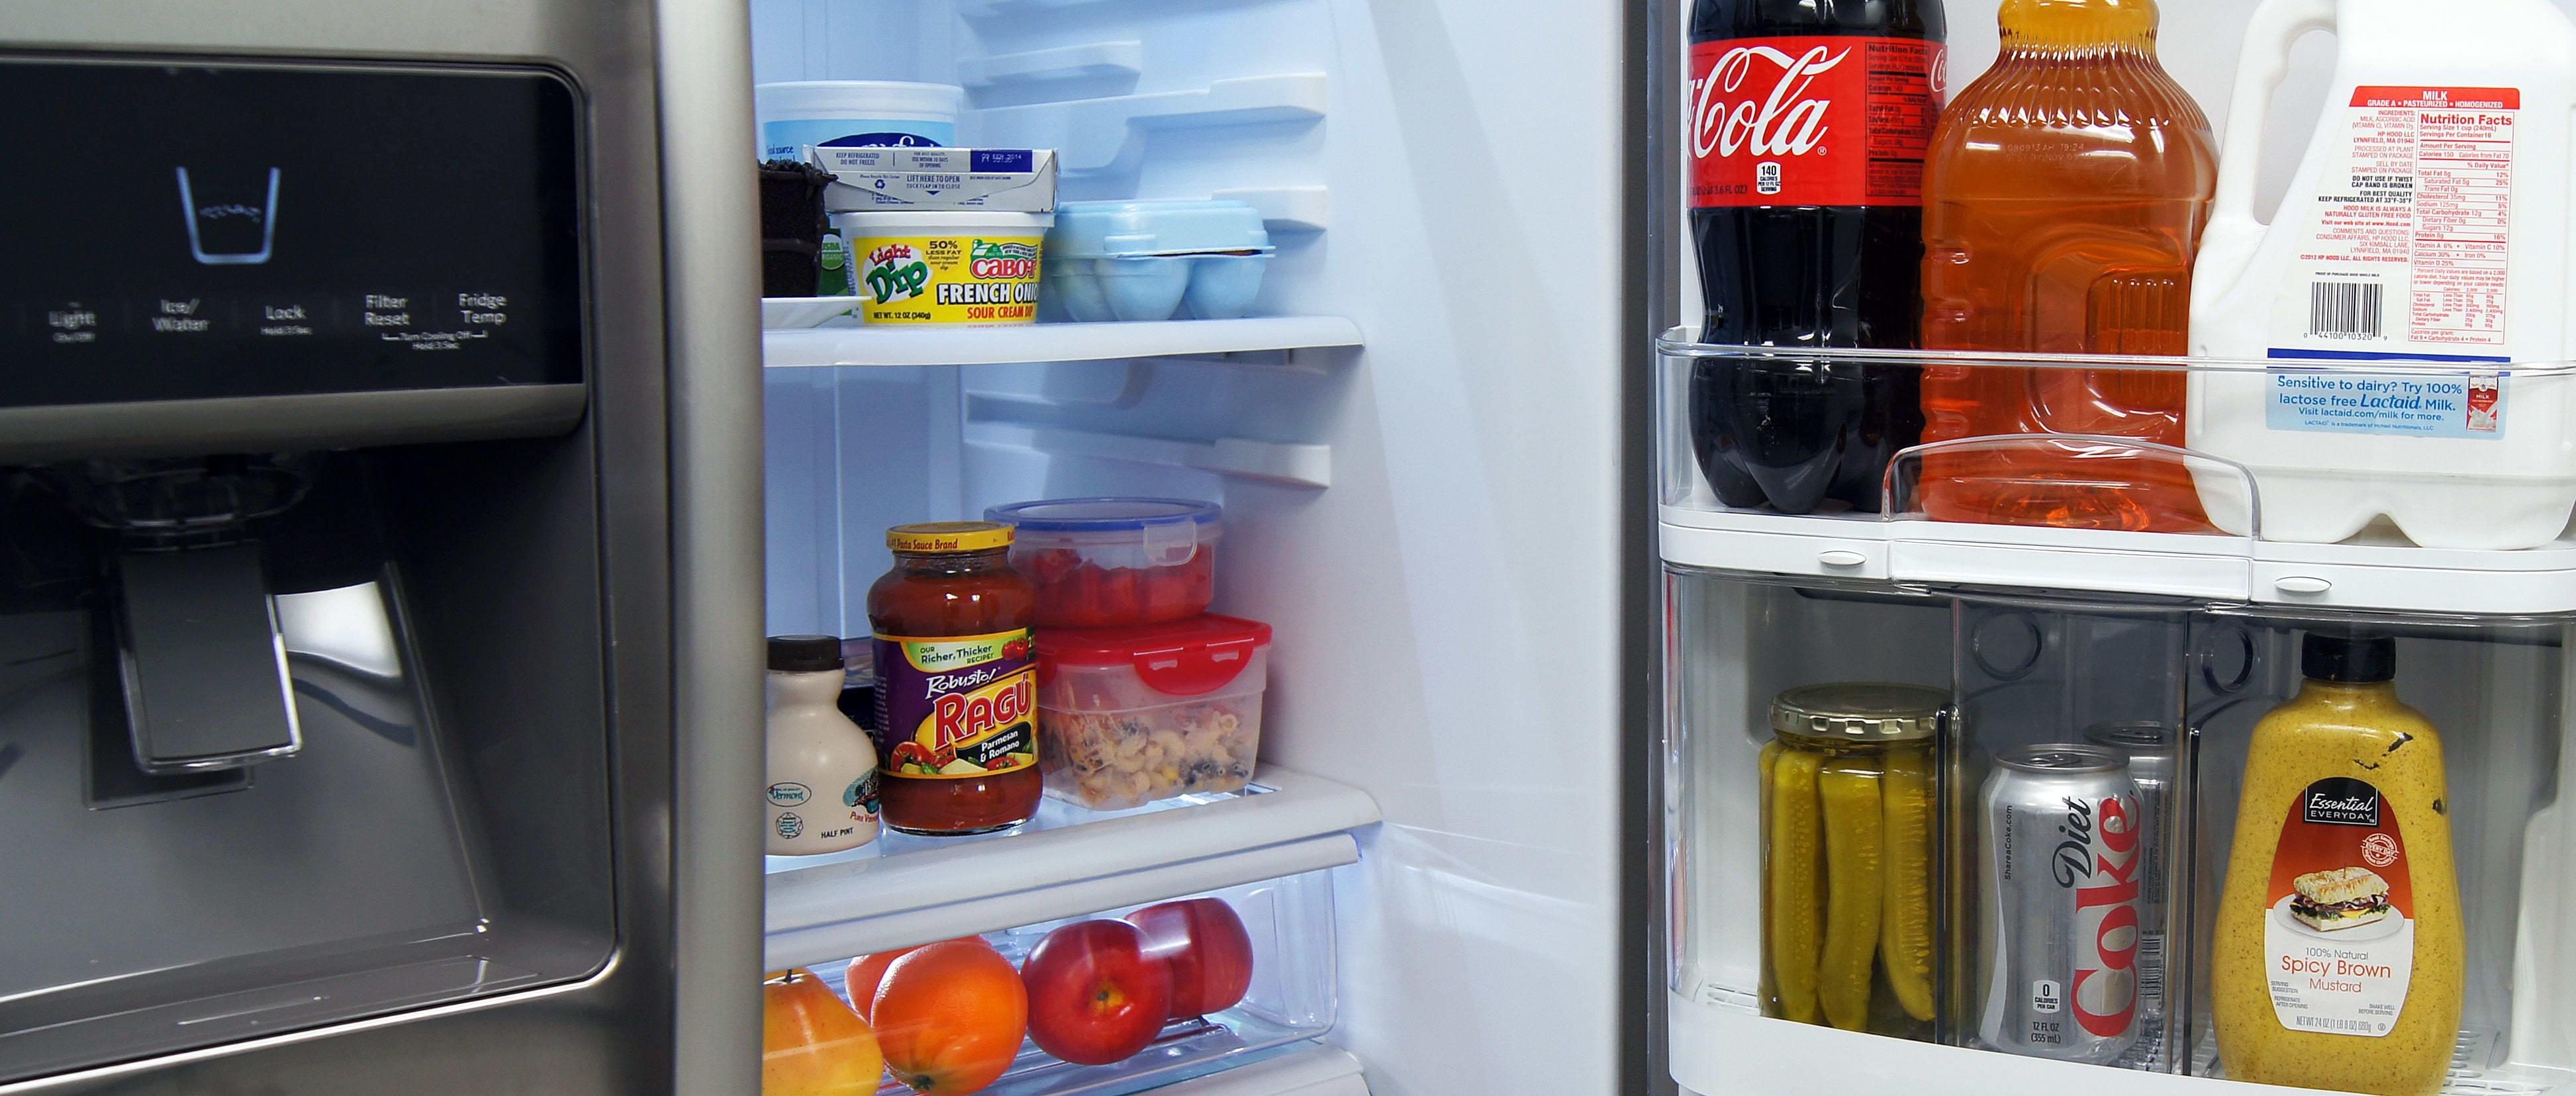 KitchenAid KSF22C4CYY Architect Series II 22 Cubic Foot Side by Side Refrigerator